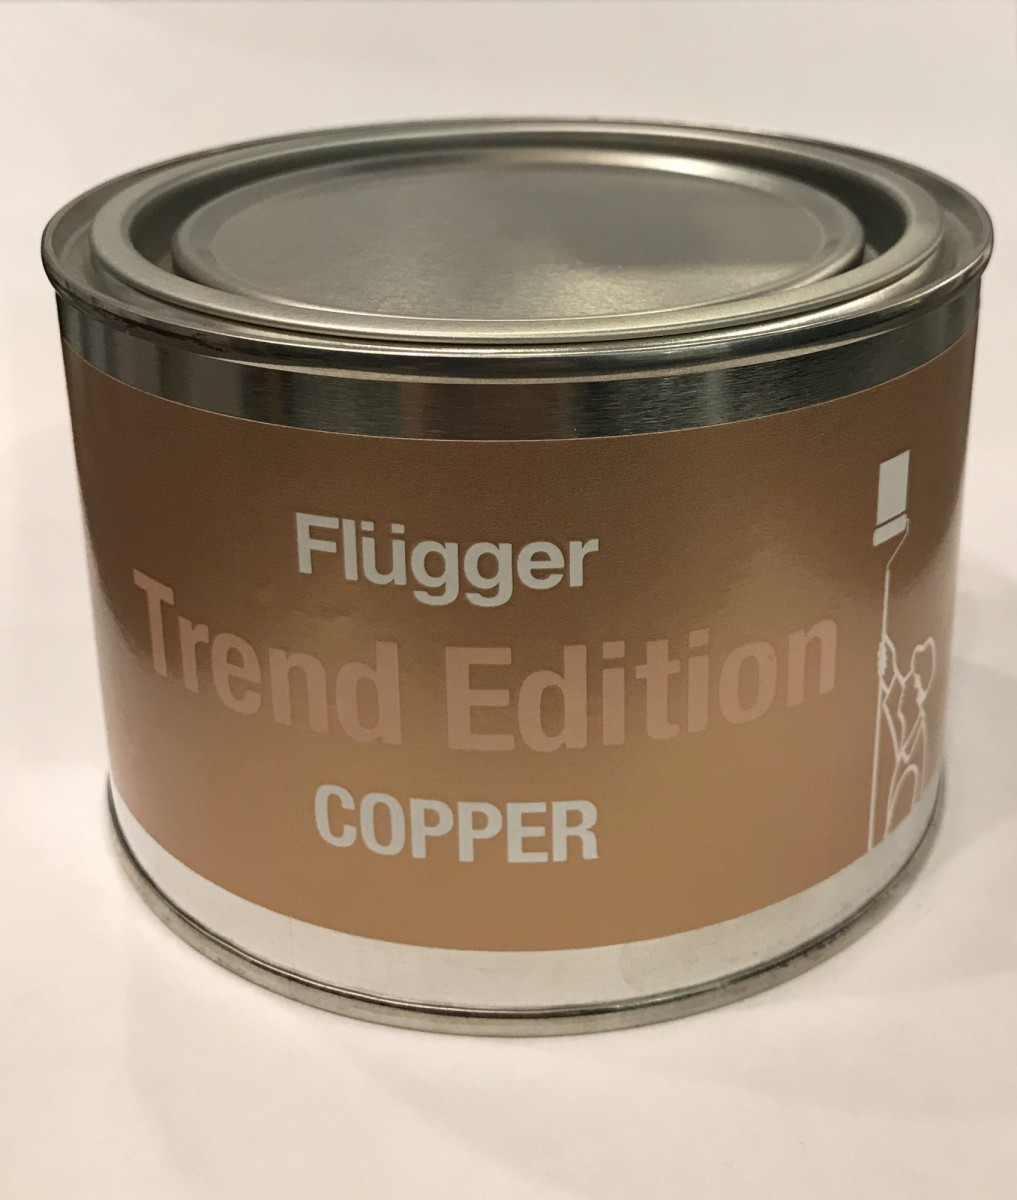 TREND EDITION COPPER декоративная краска цвета медь